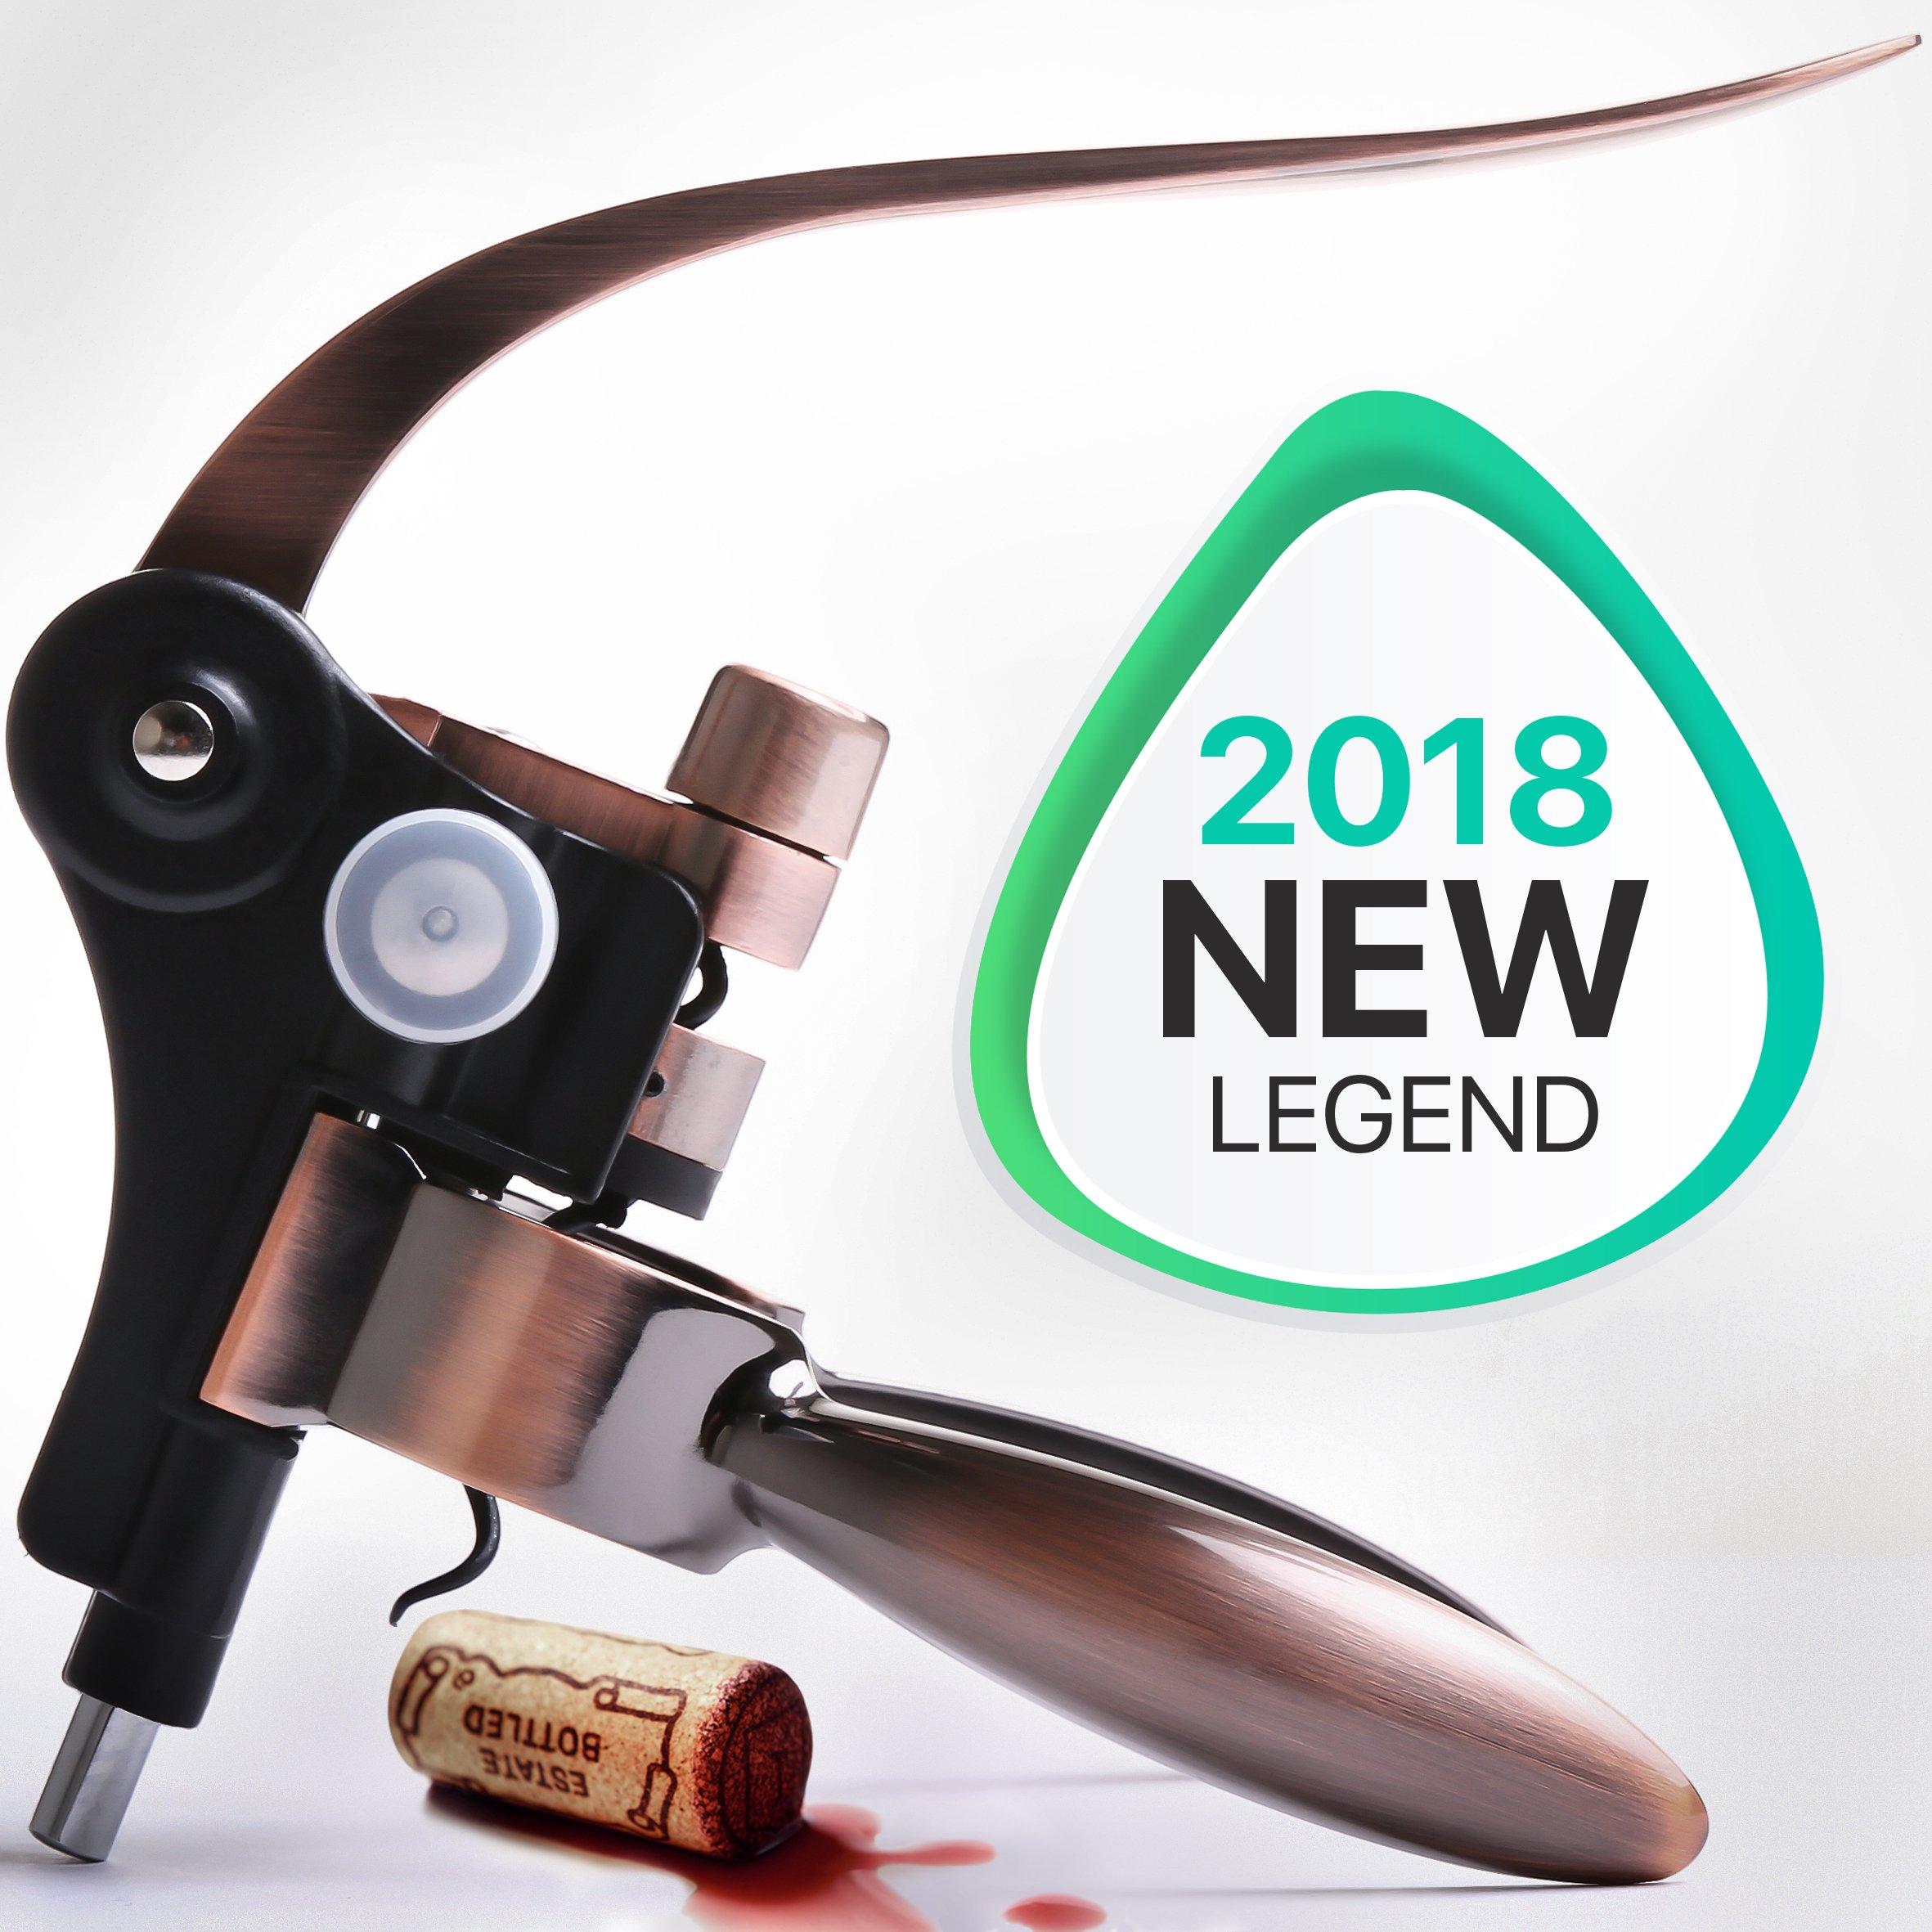 Wine Opener - Wine Accessories - Rabitt Wine Bottle Opener - Wine Corkscrew - The Best Wine Tool Kit For Women - Large Manual Wine Set For Men - Lever Cork Opener